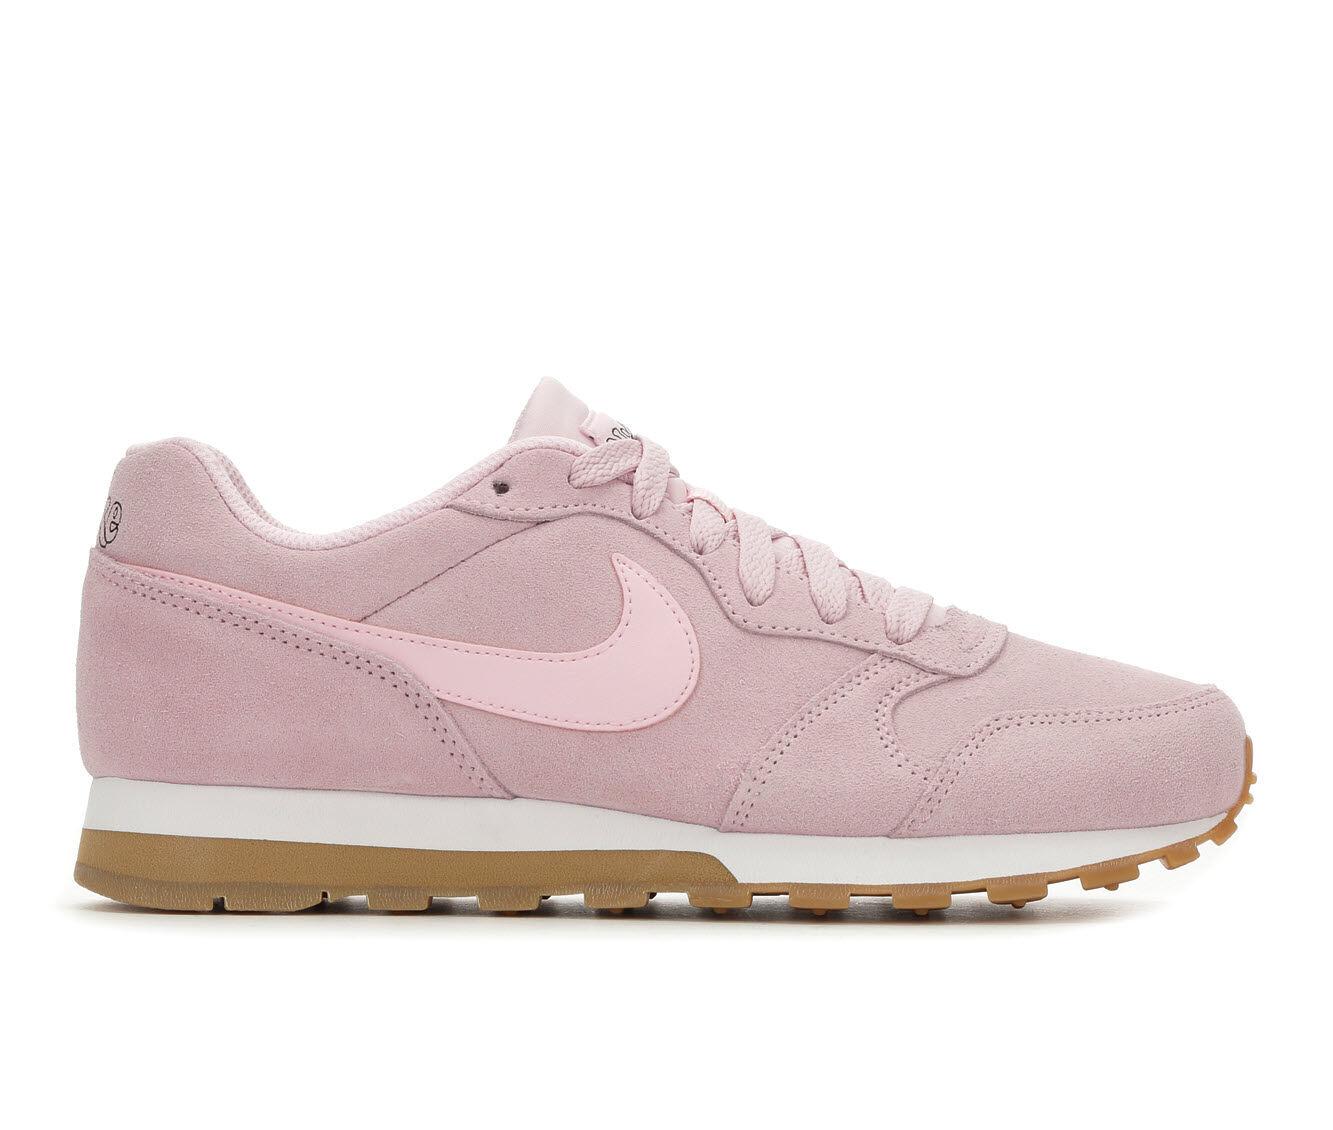 uk shoes_kd4559